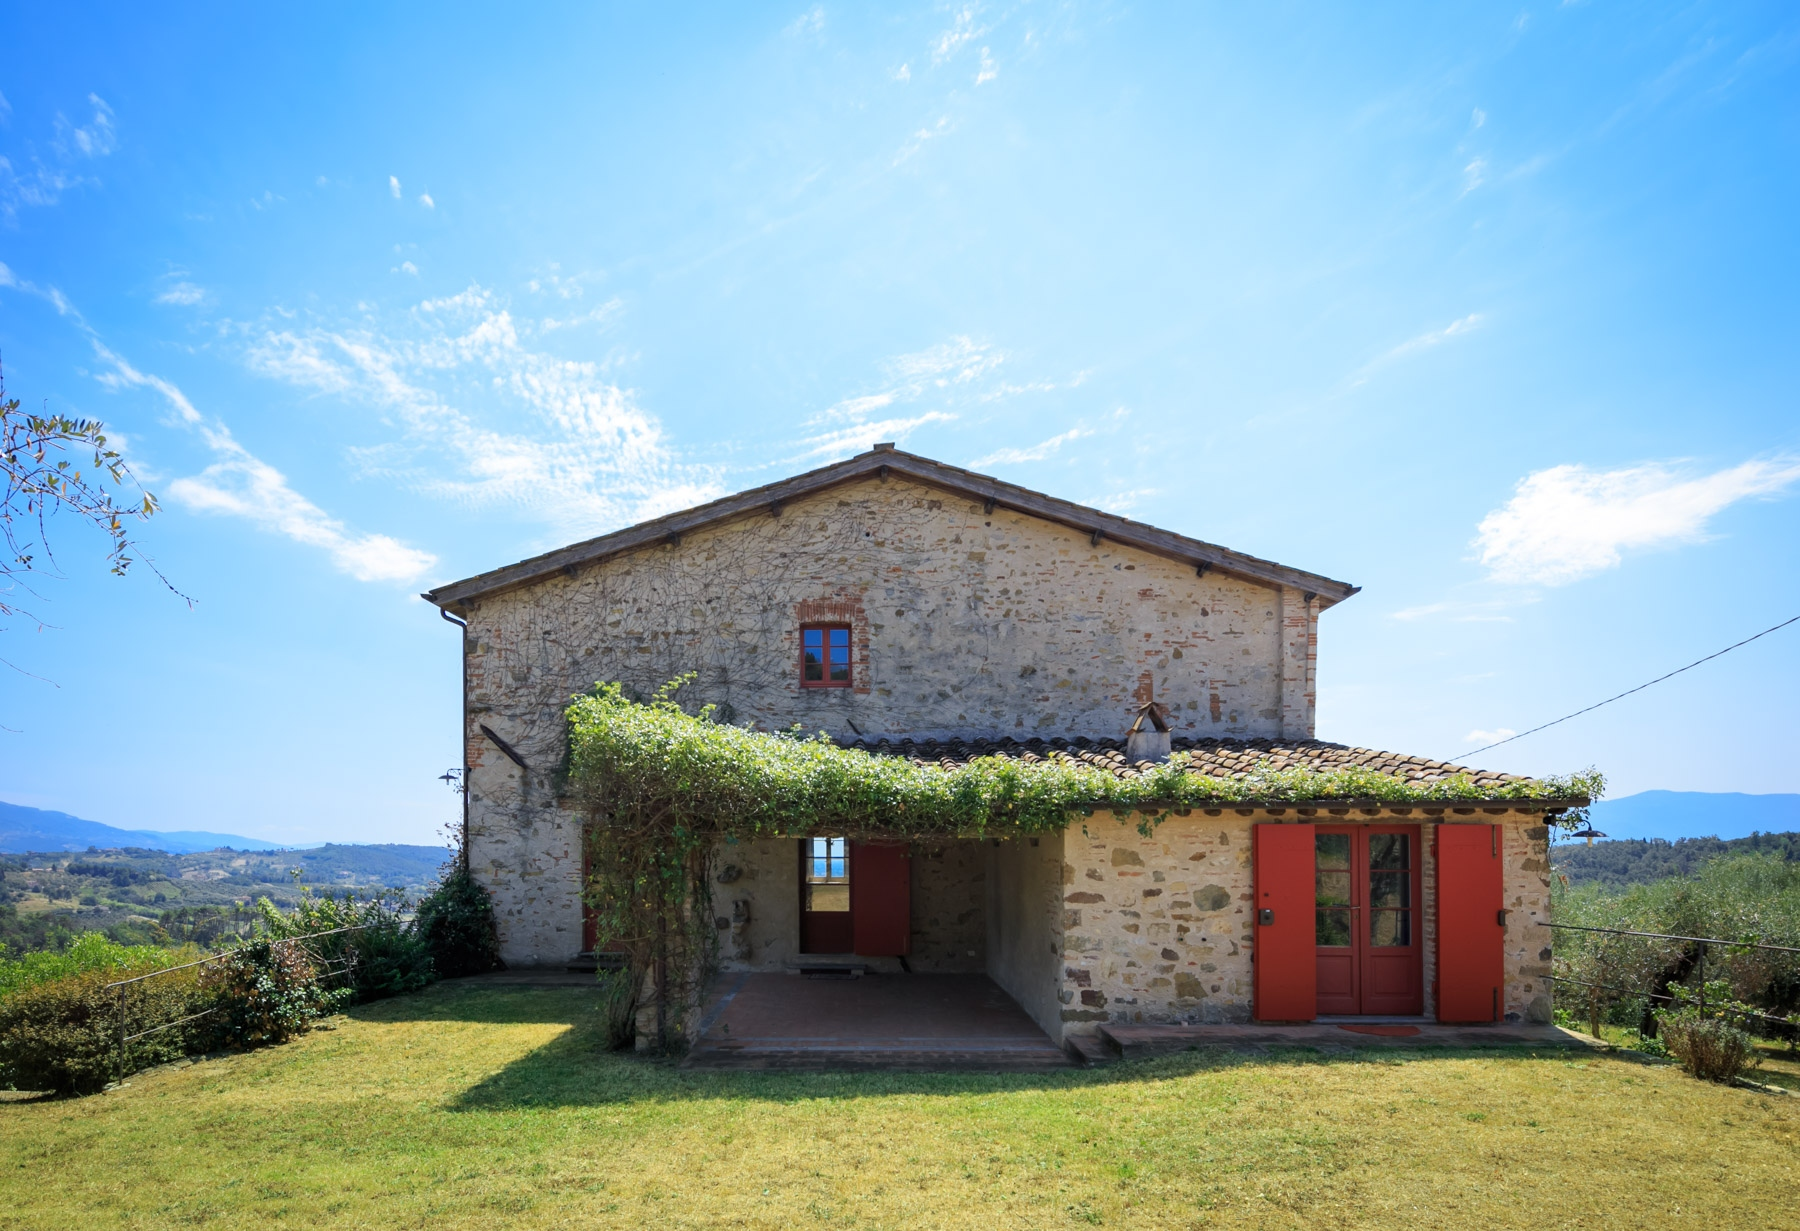 Villa in Vendita a Lucca: 5 locali, 225 mq - Foto 1